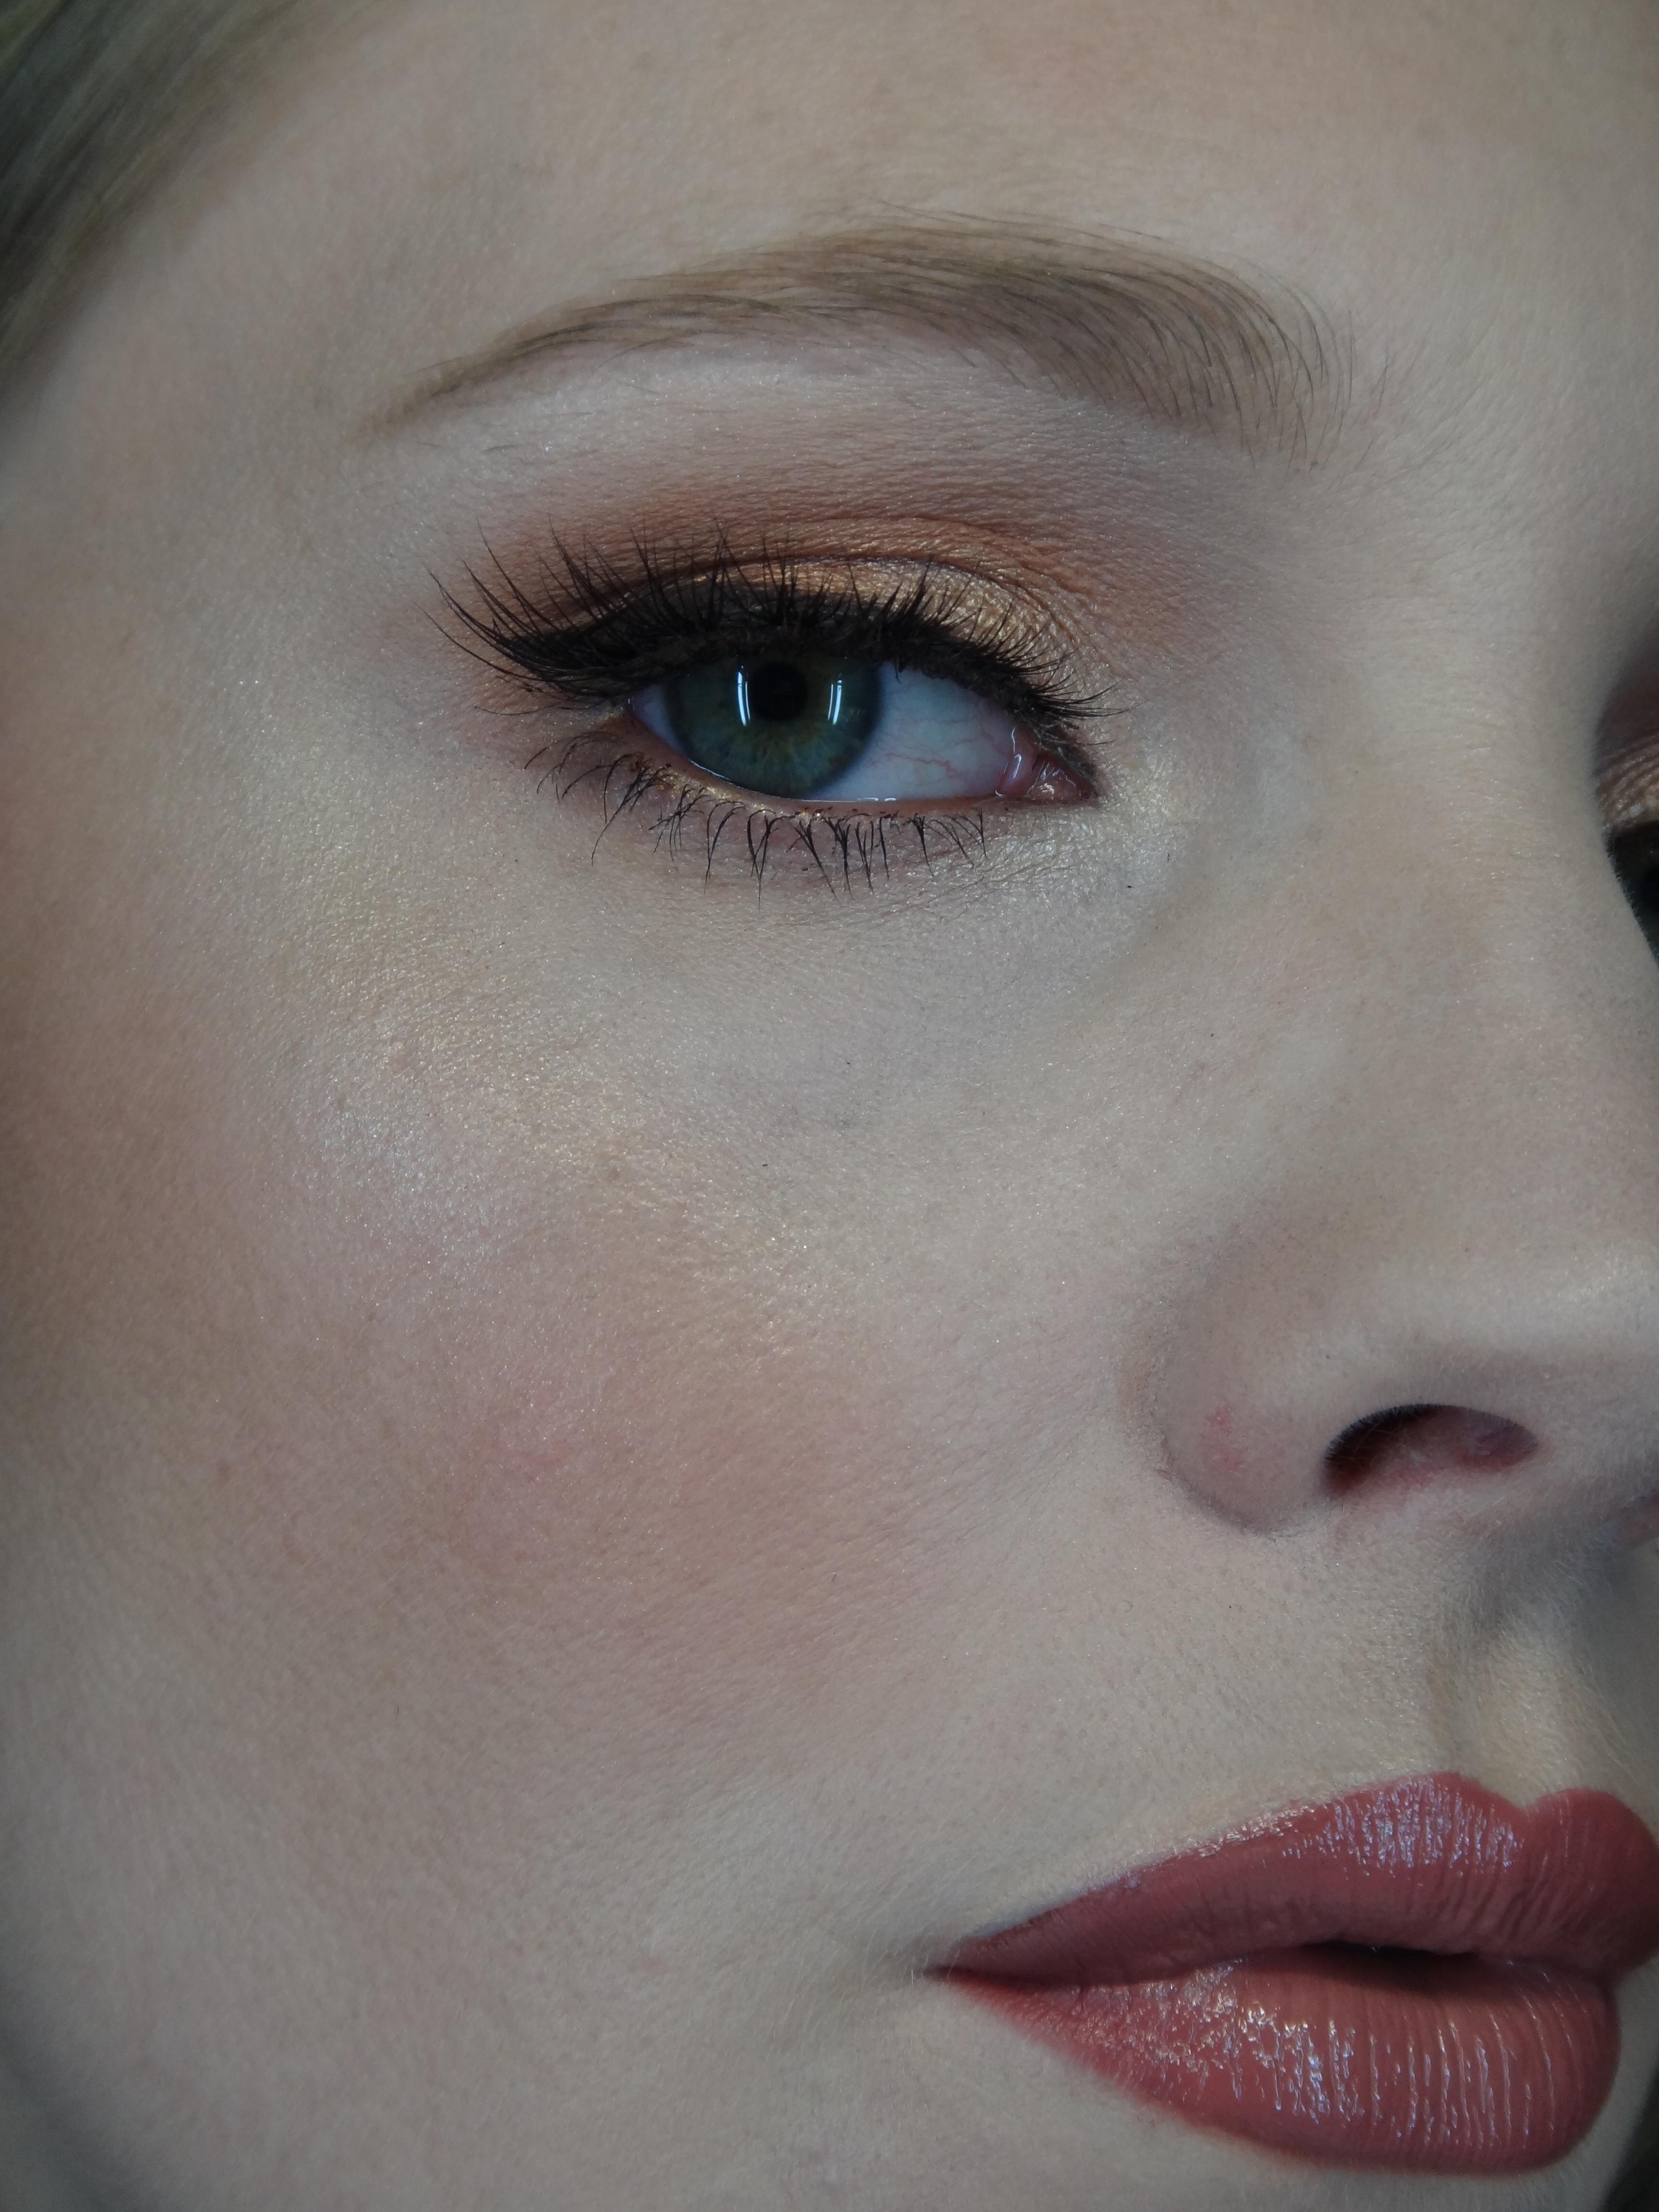 By Terry Jasmyn West Makeup Artist